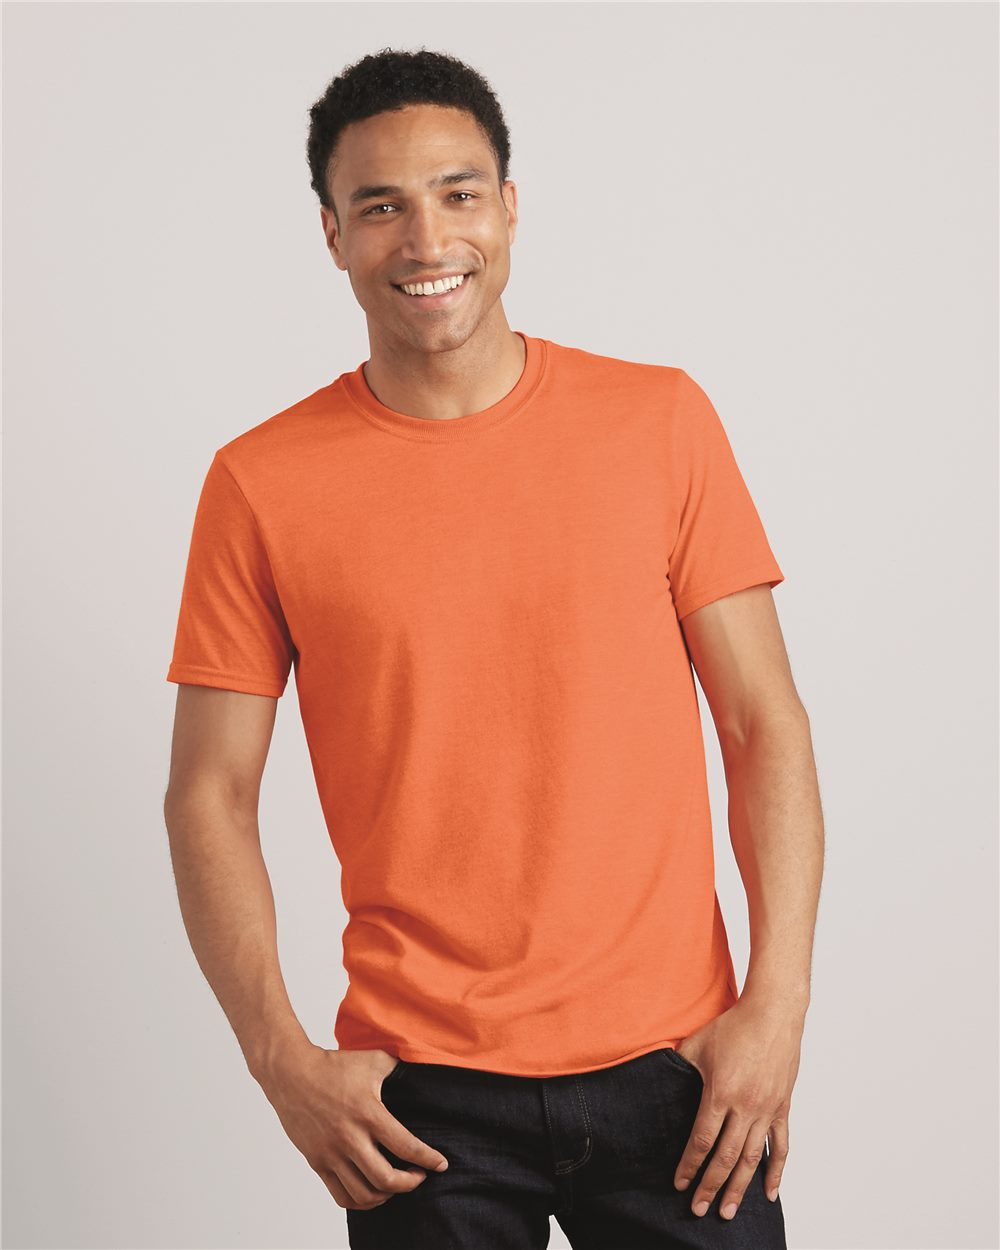 Gildan 吉尔丹 64000 男士舒适T恤